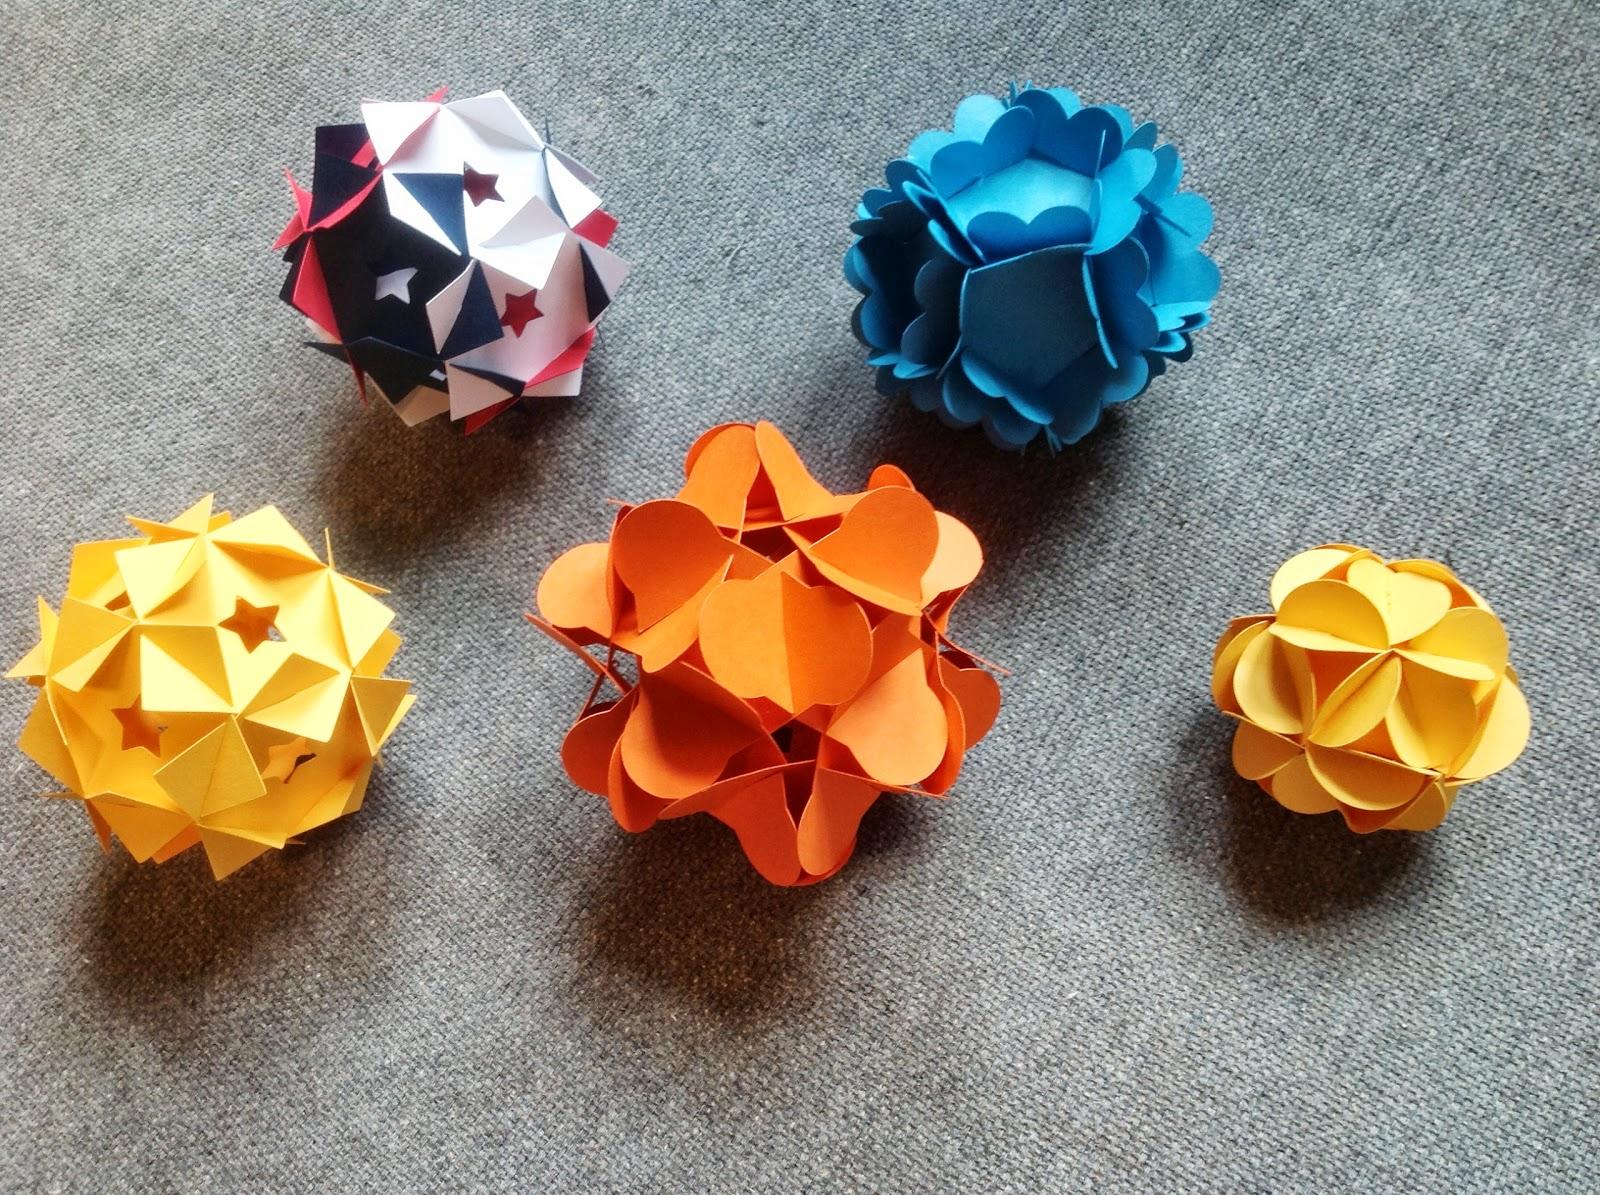 Making Large Origami Buckyballs, Part 1 - YouTube | 1195x1600